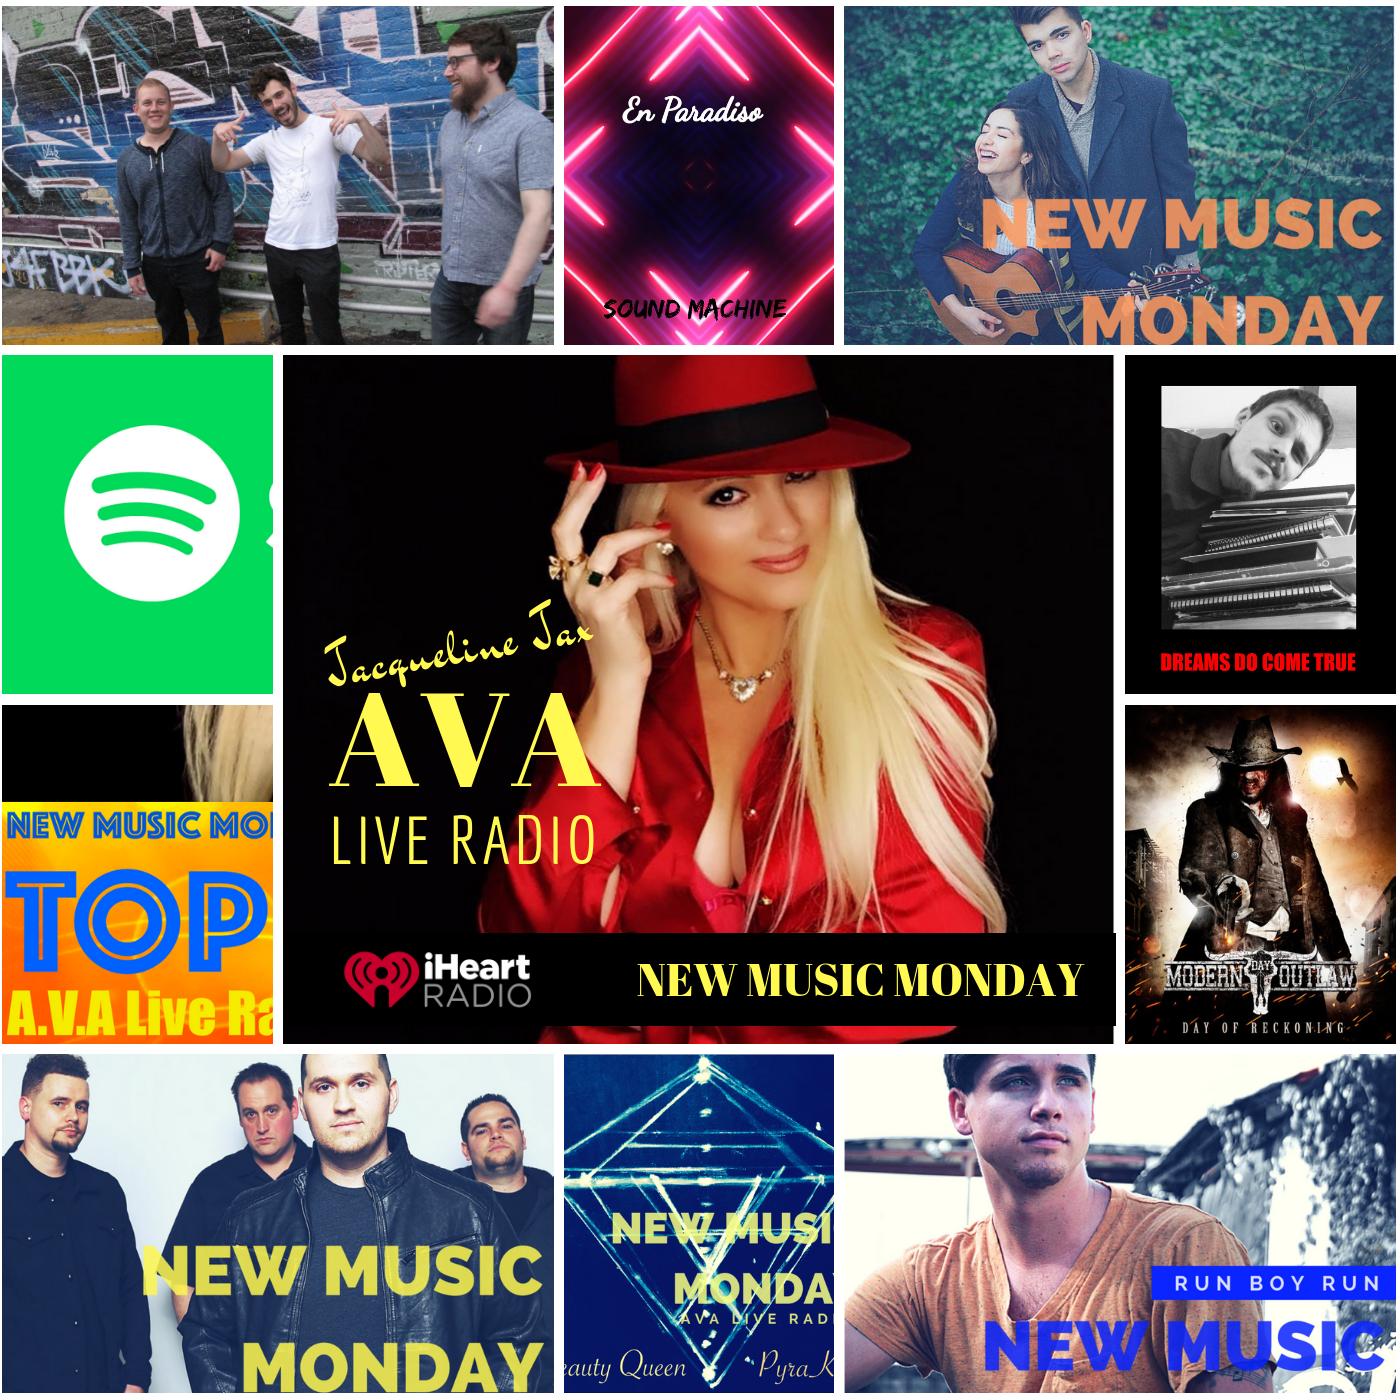 New Music Monday avaliveradio.png